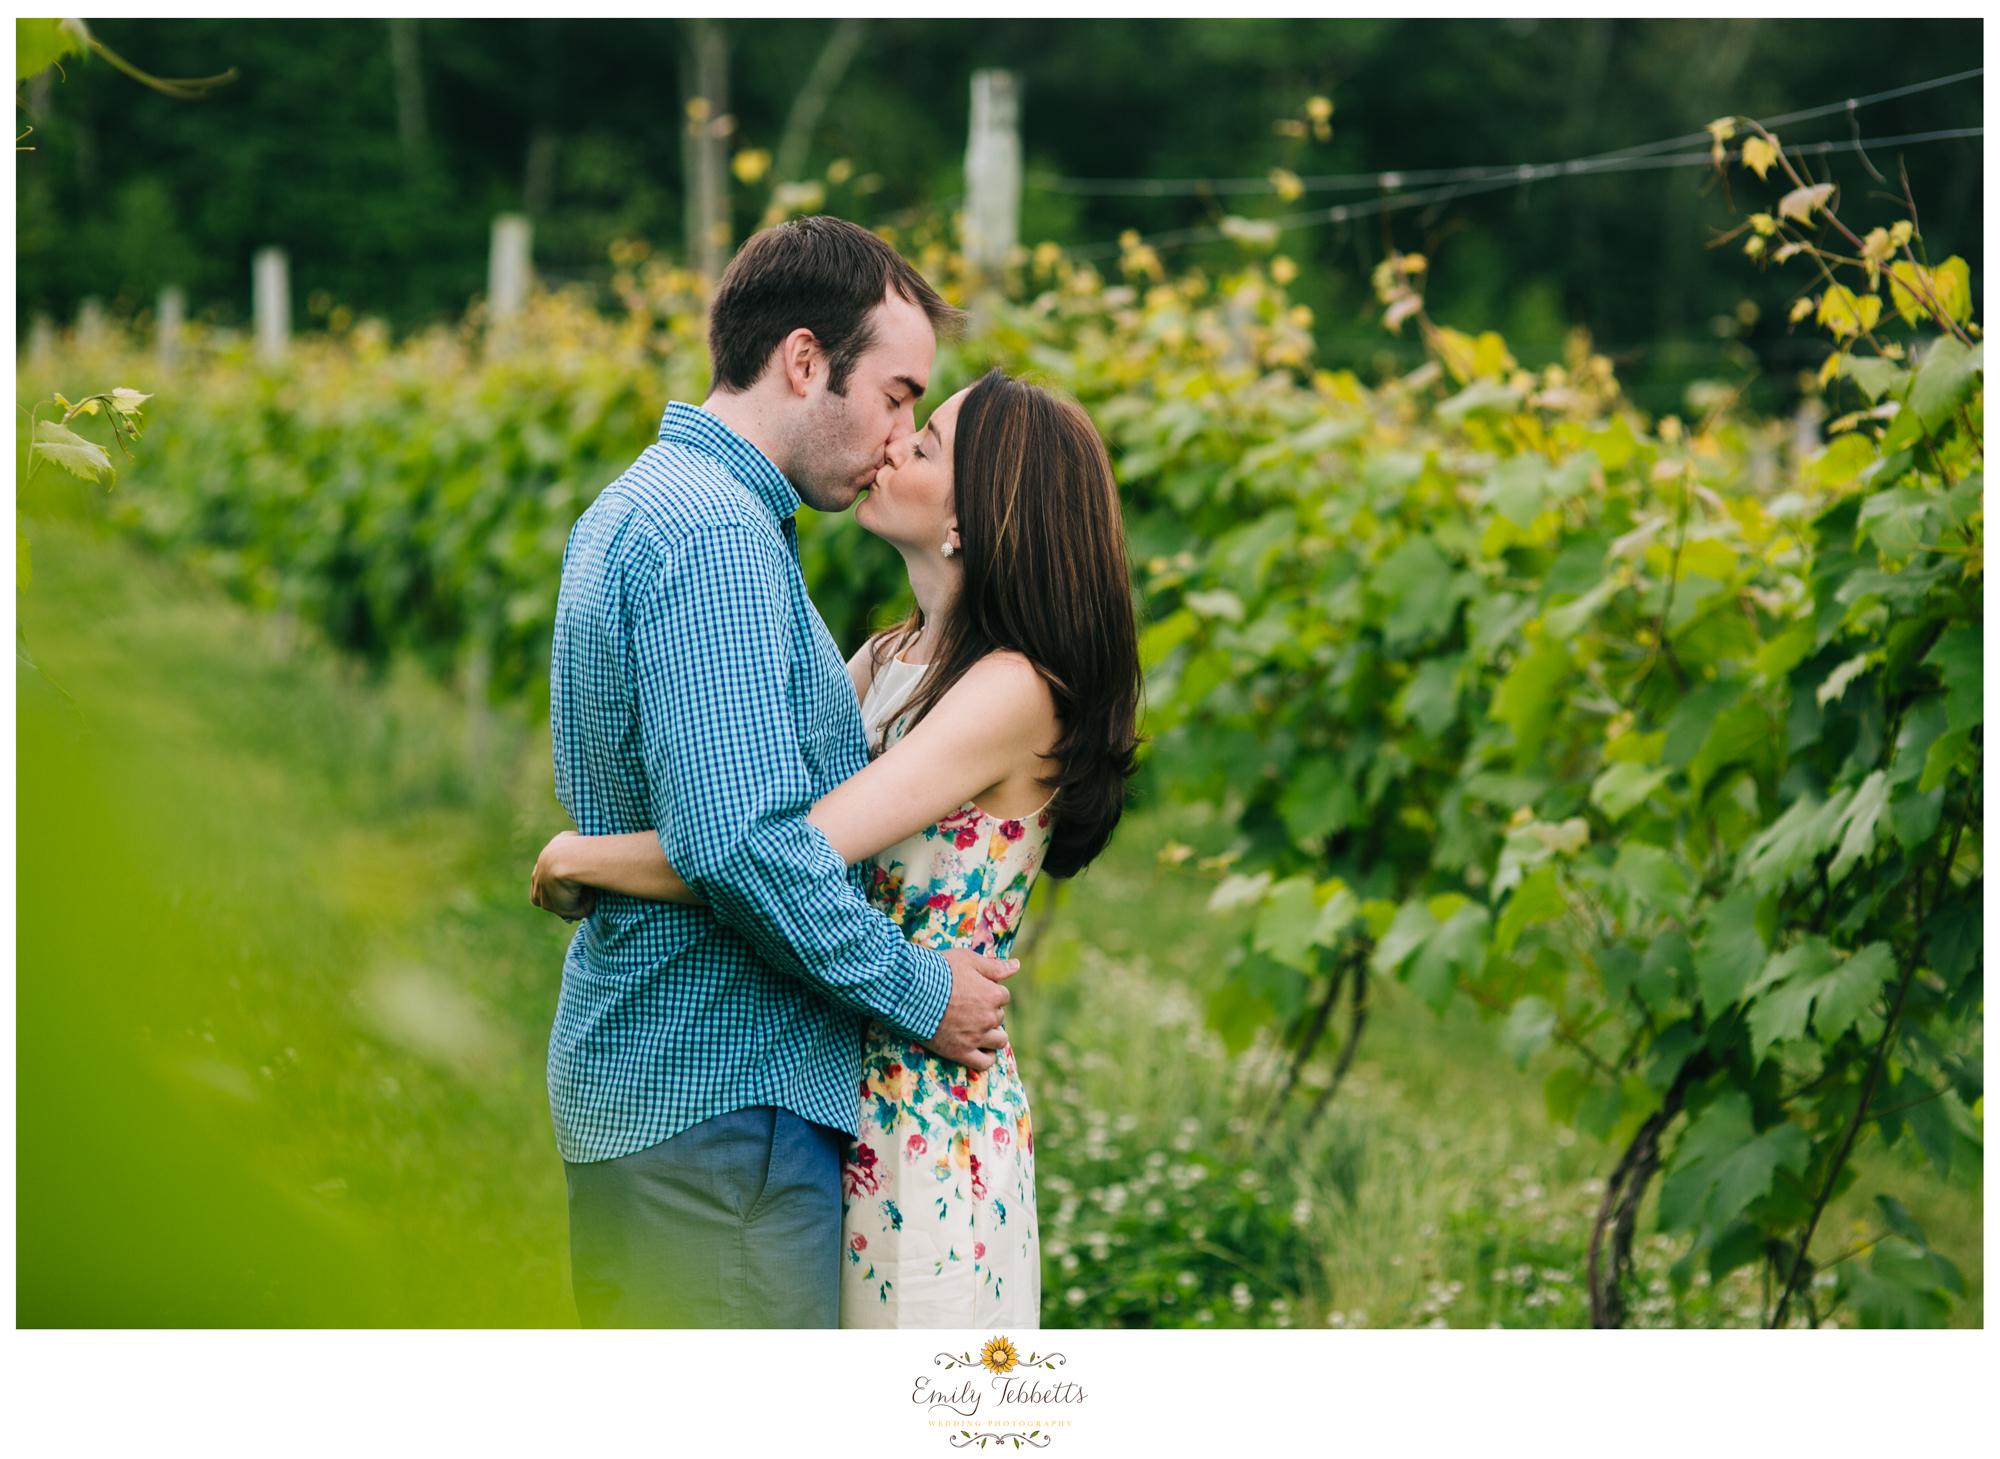 Emily Tebbetts Wedding Photography New England CT Connecticut Engagement session Vineyard